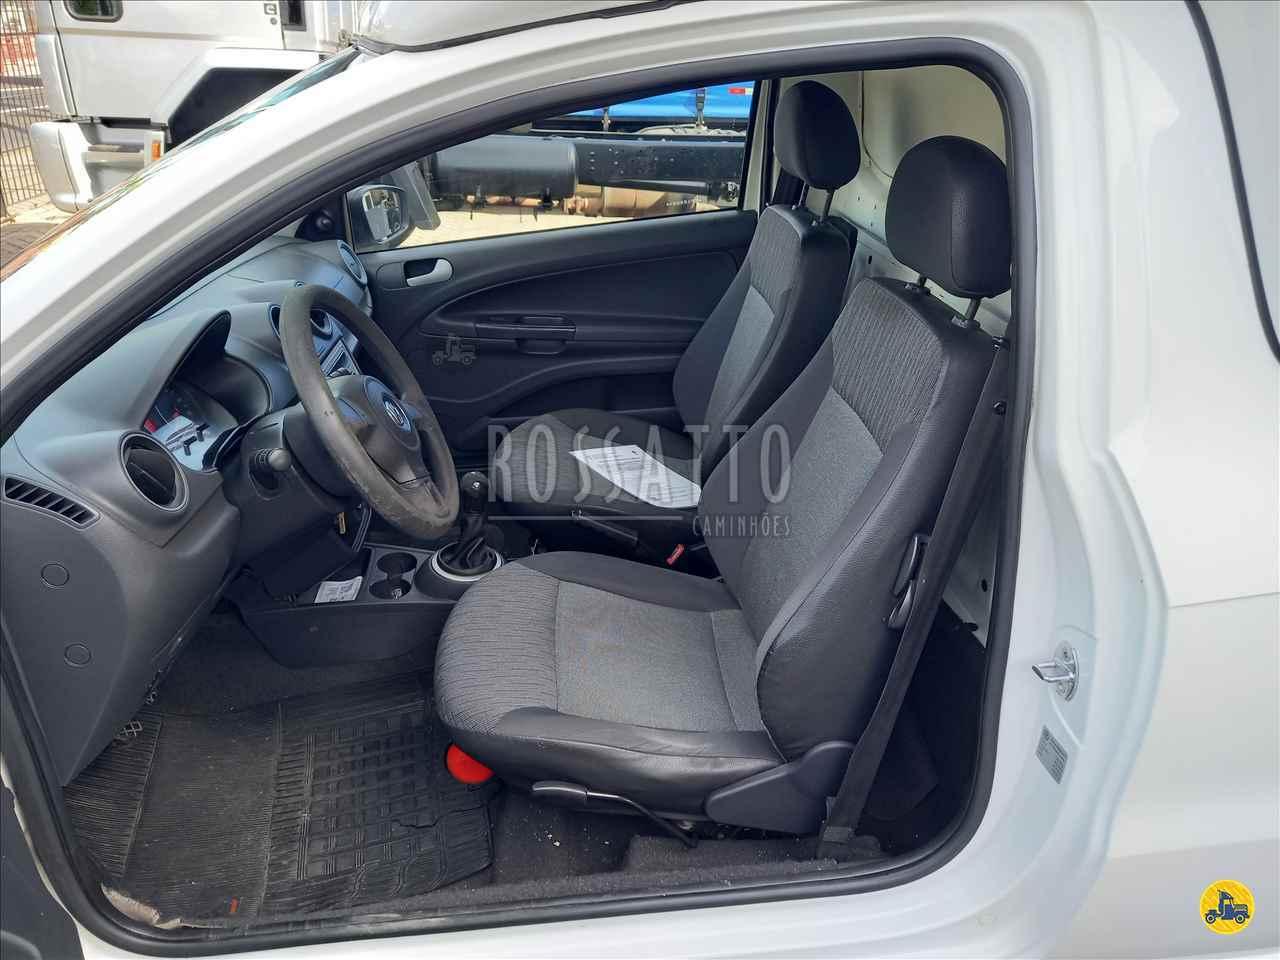 VW - Volkswagen Saveiro 1.6 CL 140000km 2014/2014 Rossatto Caminhões